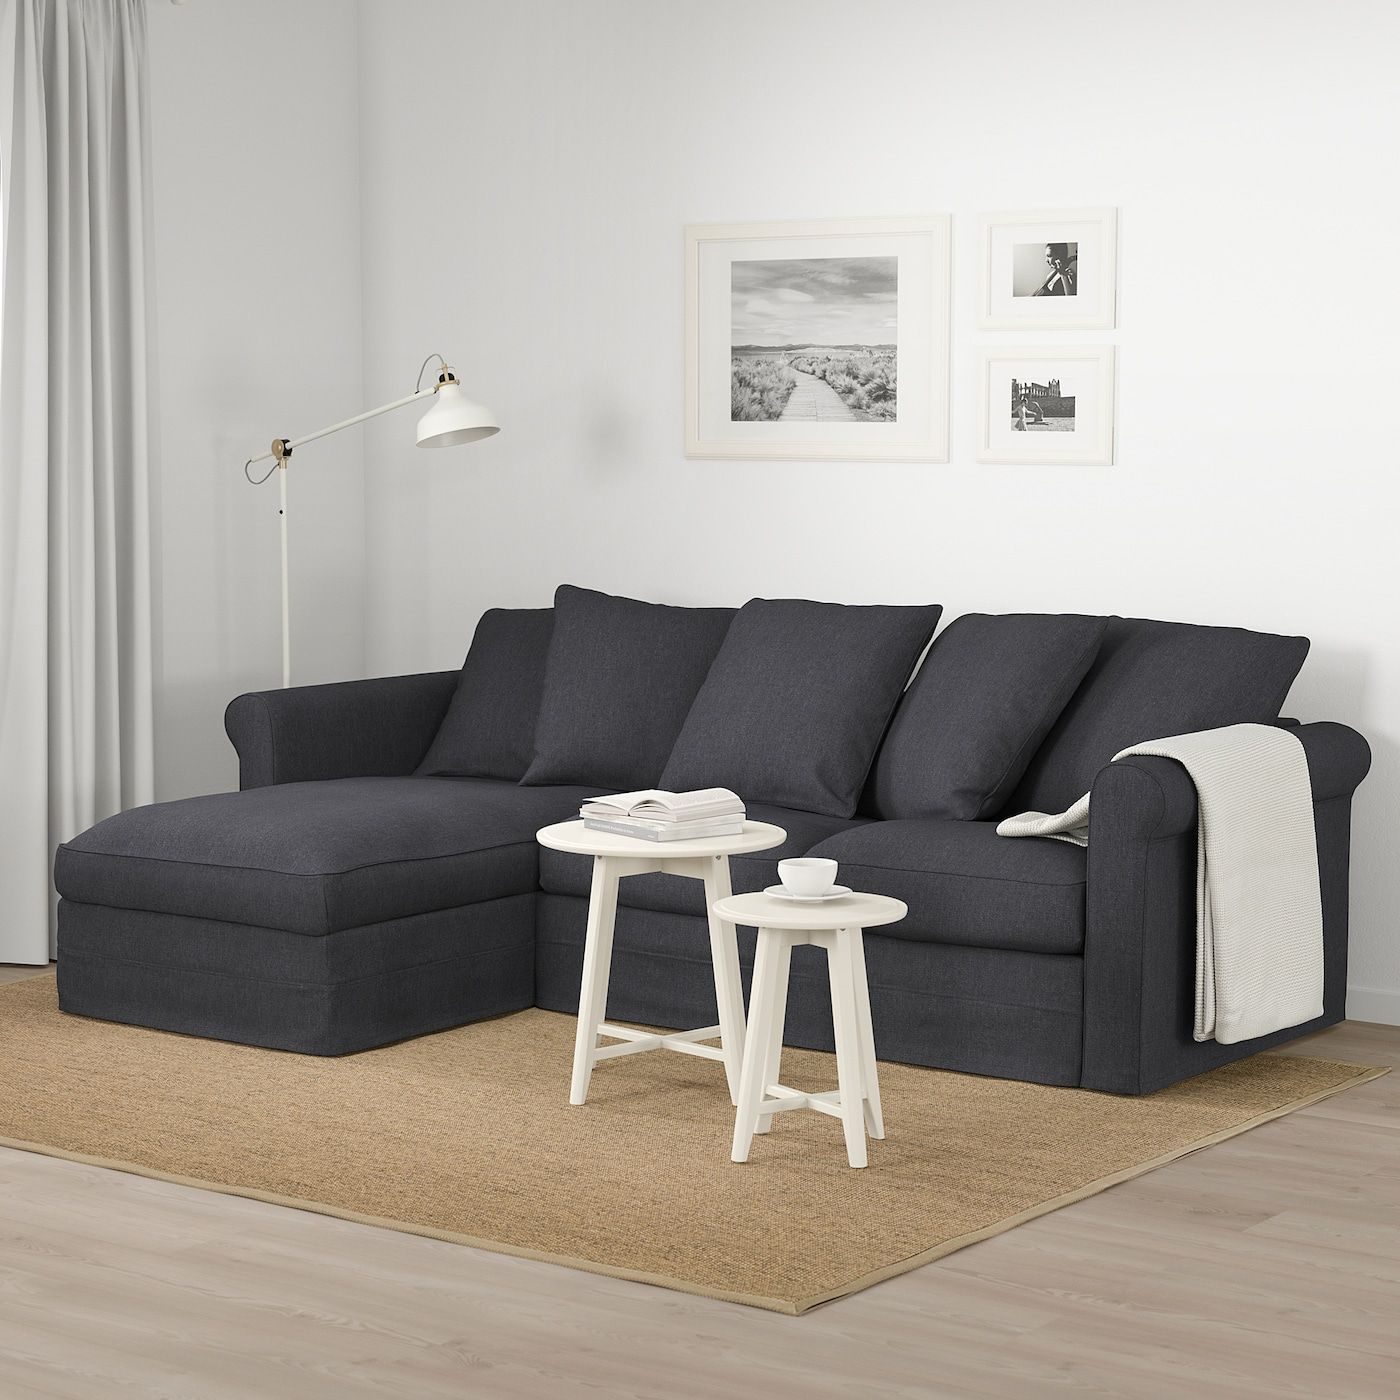 Ikea Gr Ouml Nlid 3er Sofa Mit R Eacute Camiere Sporda Dunkelgrau In 2020 3er Sofa Sofa Stoff Chaiselongue